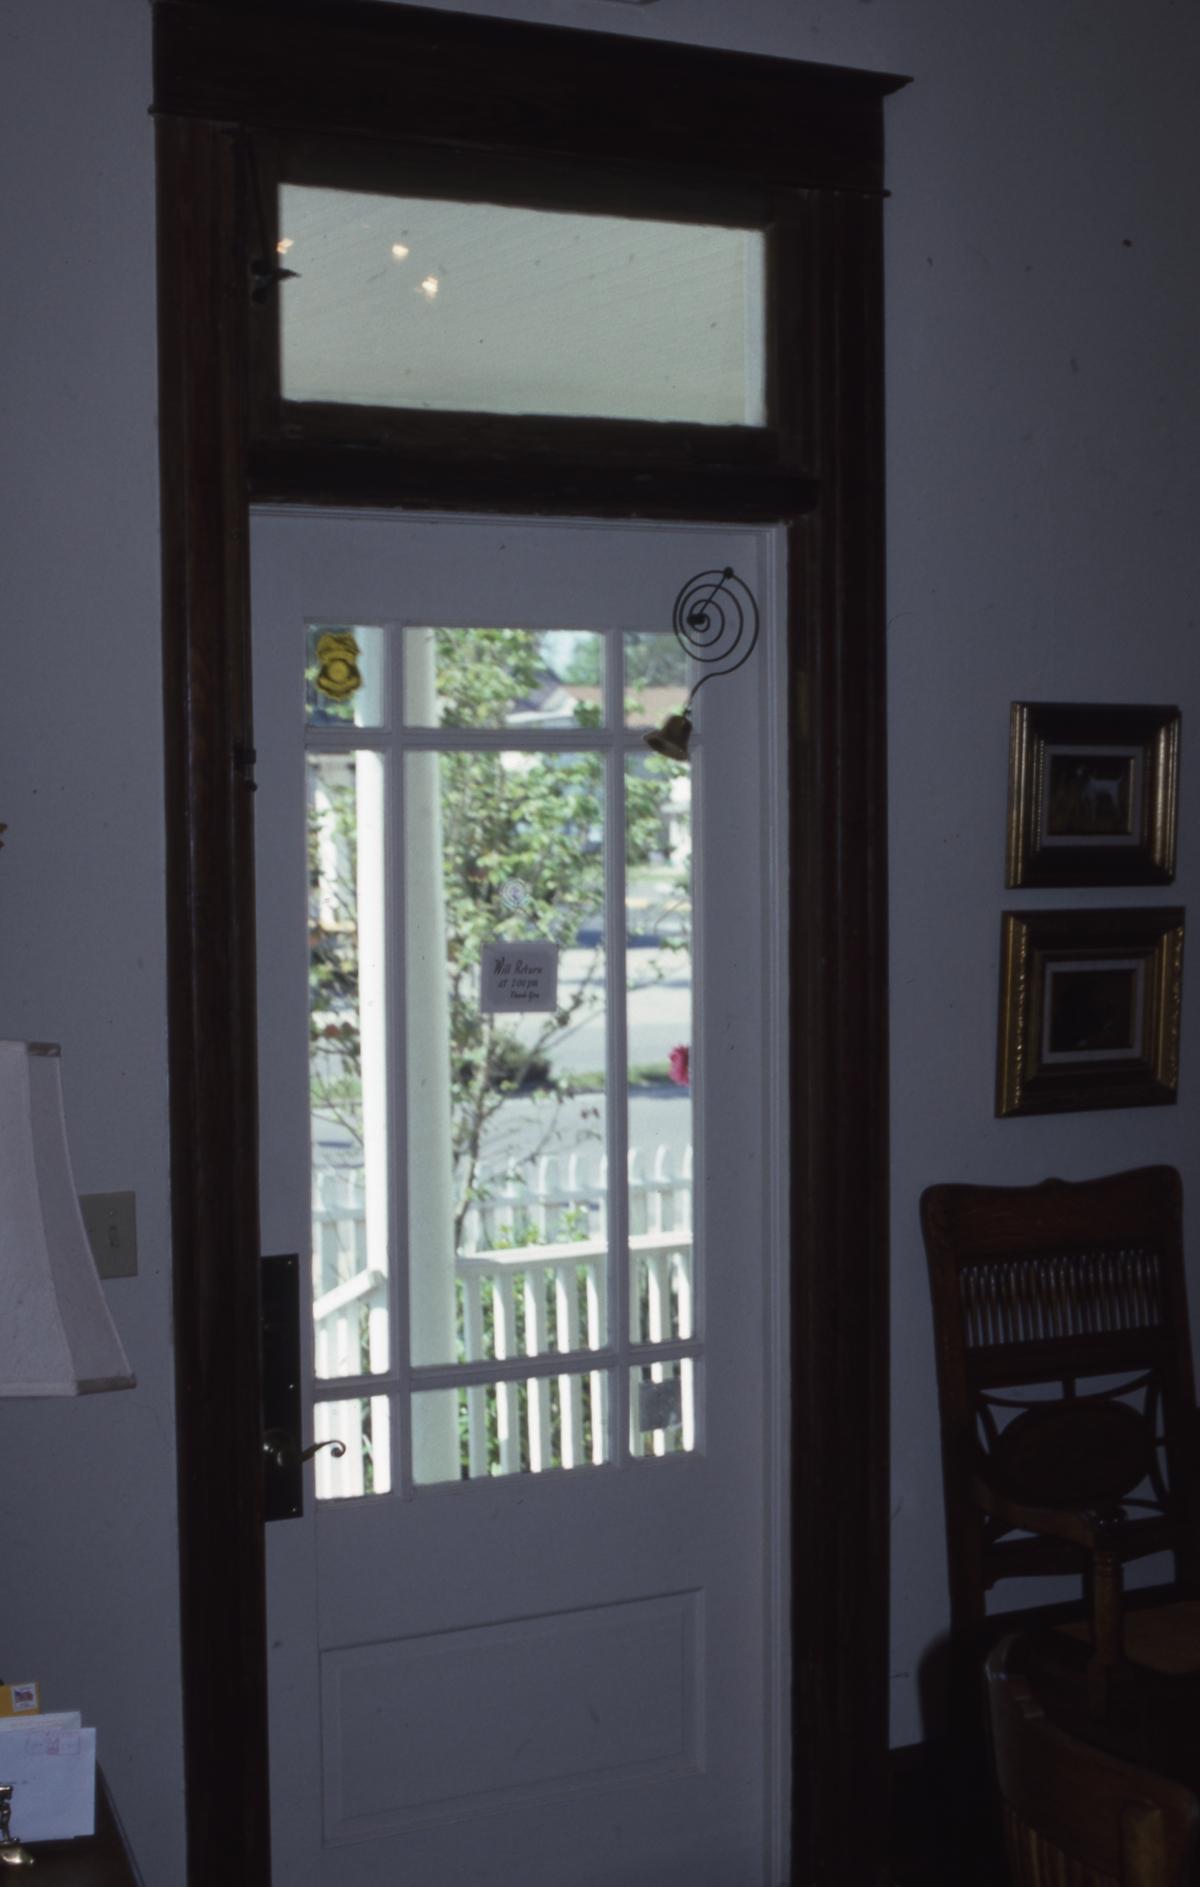 Photographs of the Captain Howard B. Jeffries House in Zephyrhills.